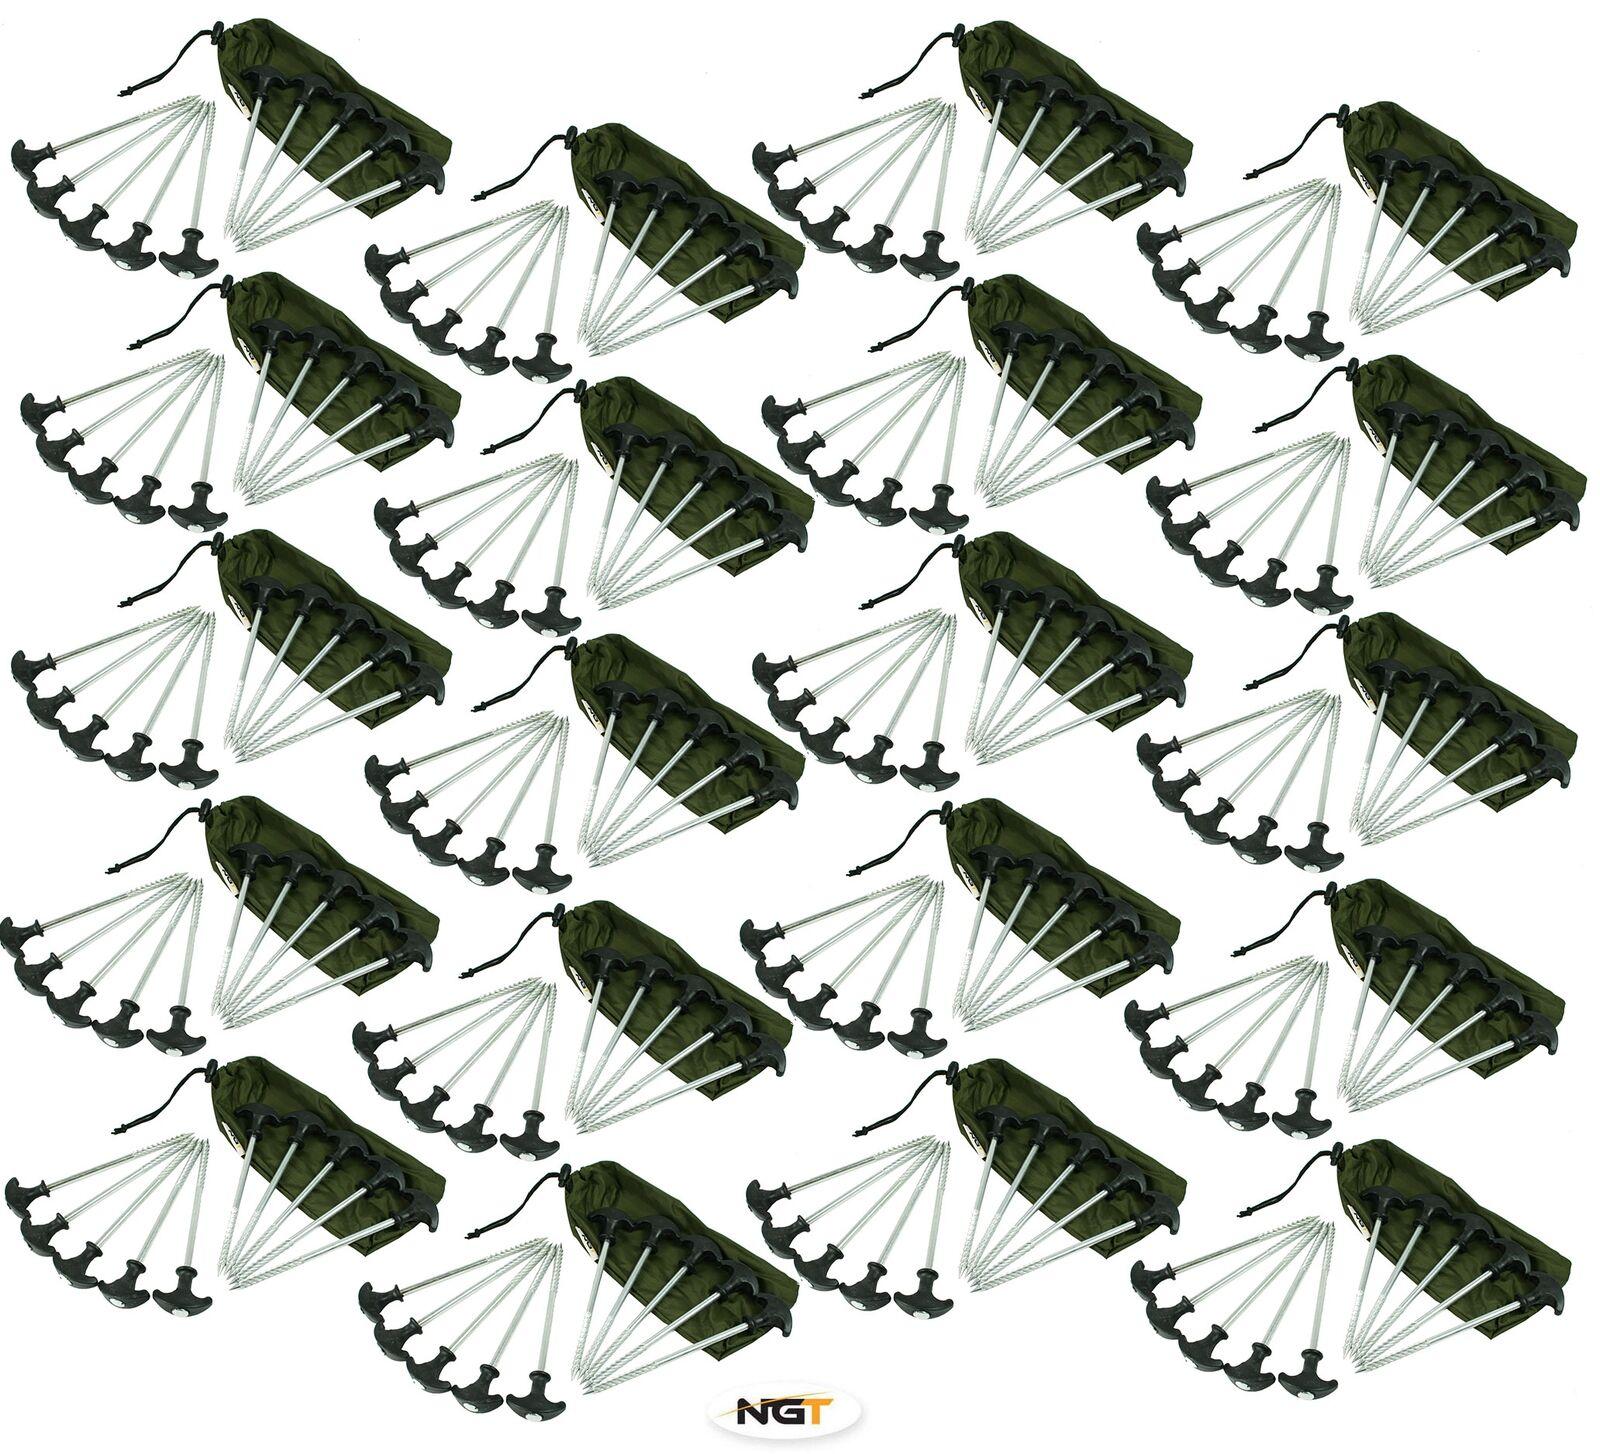 200 x HEAVY DUTY CARP FISHING BIVVY PEGS CAMPING TENT PEG WHOLESALE